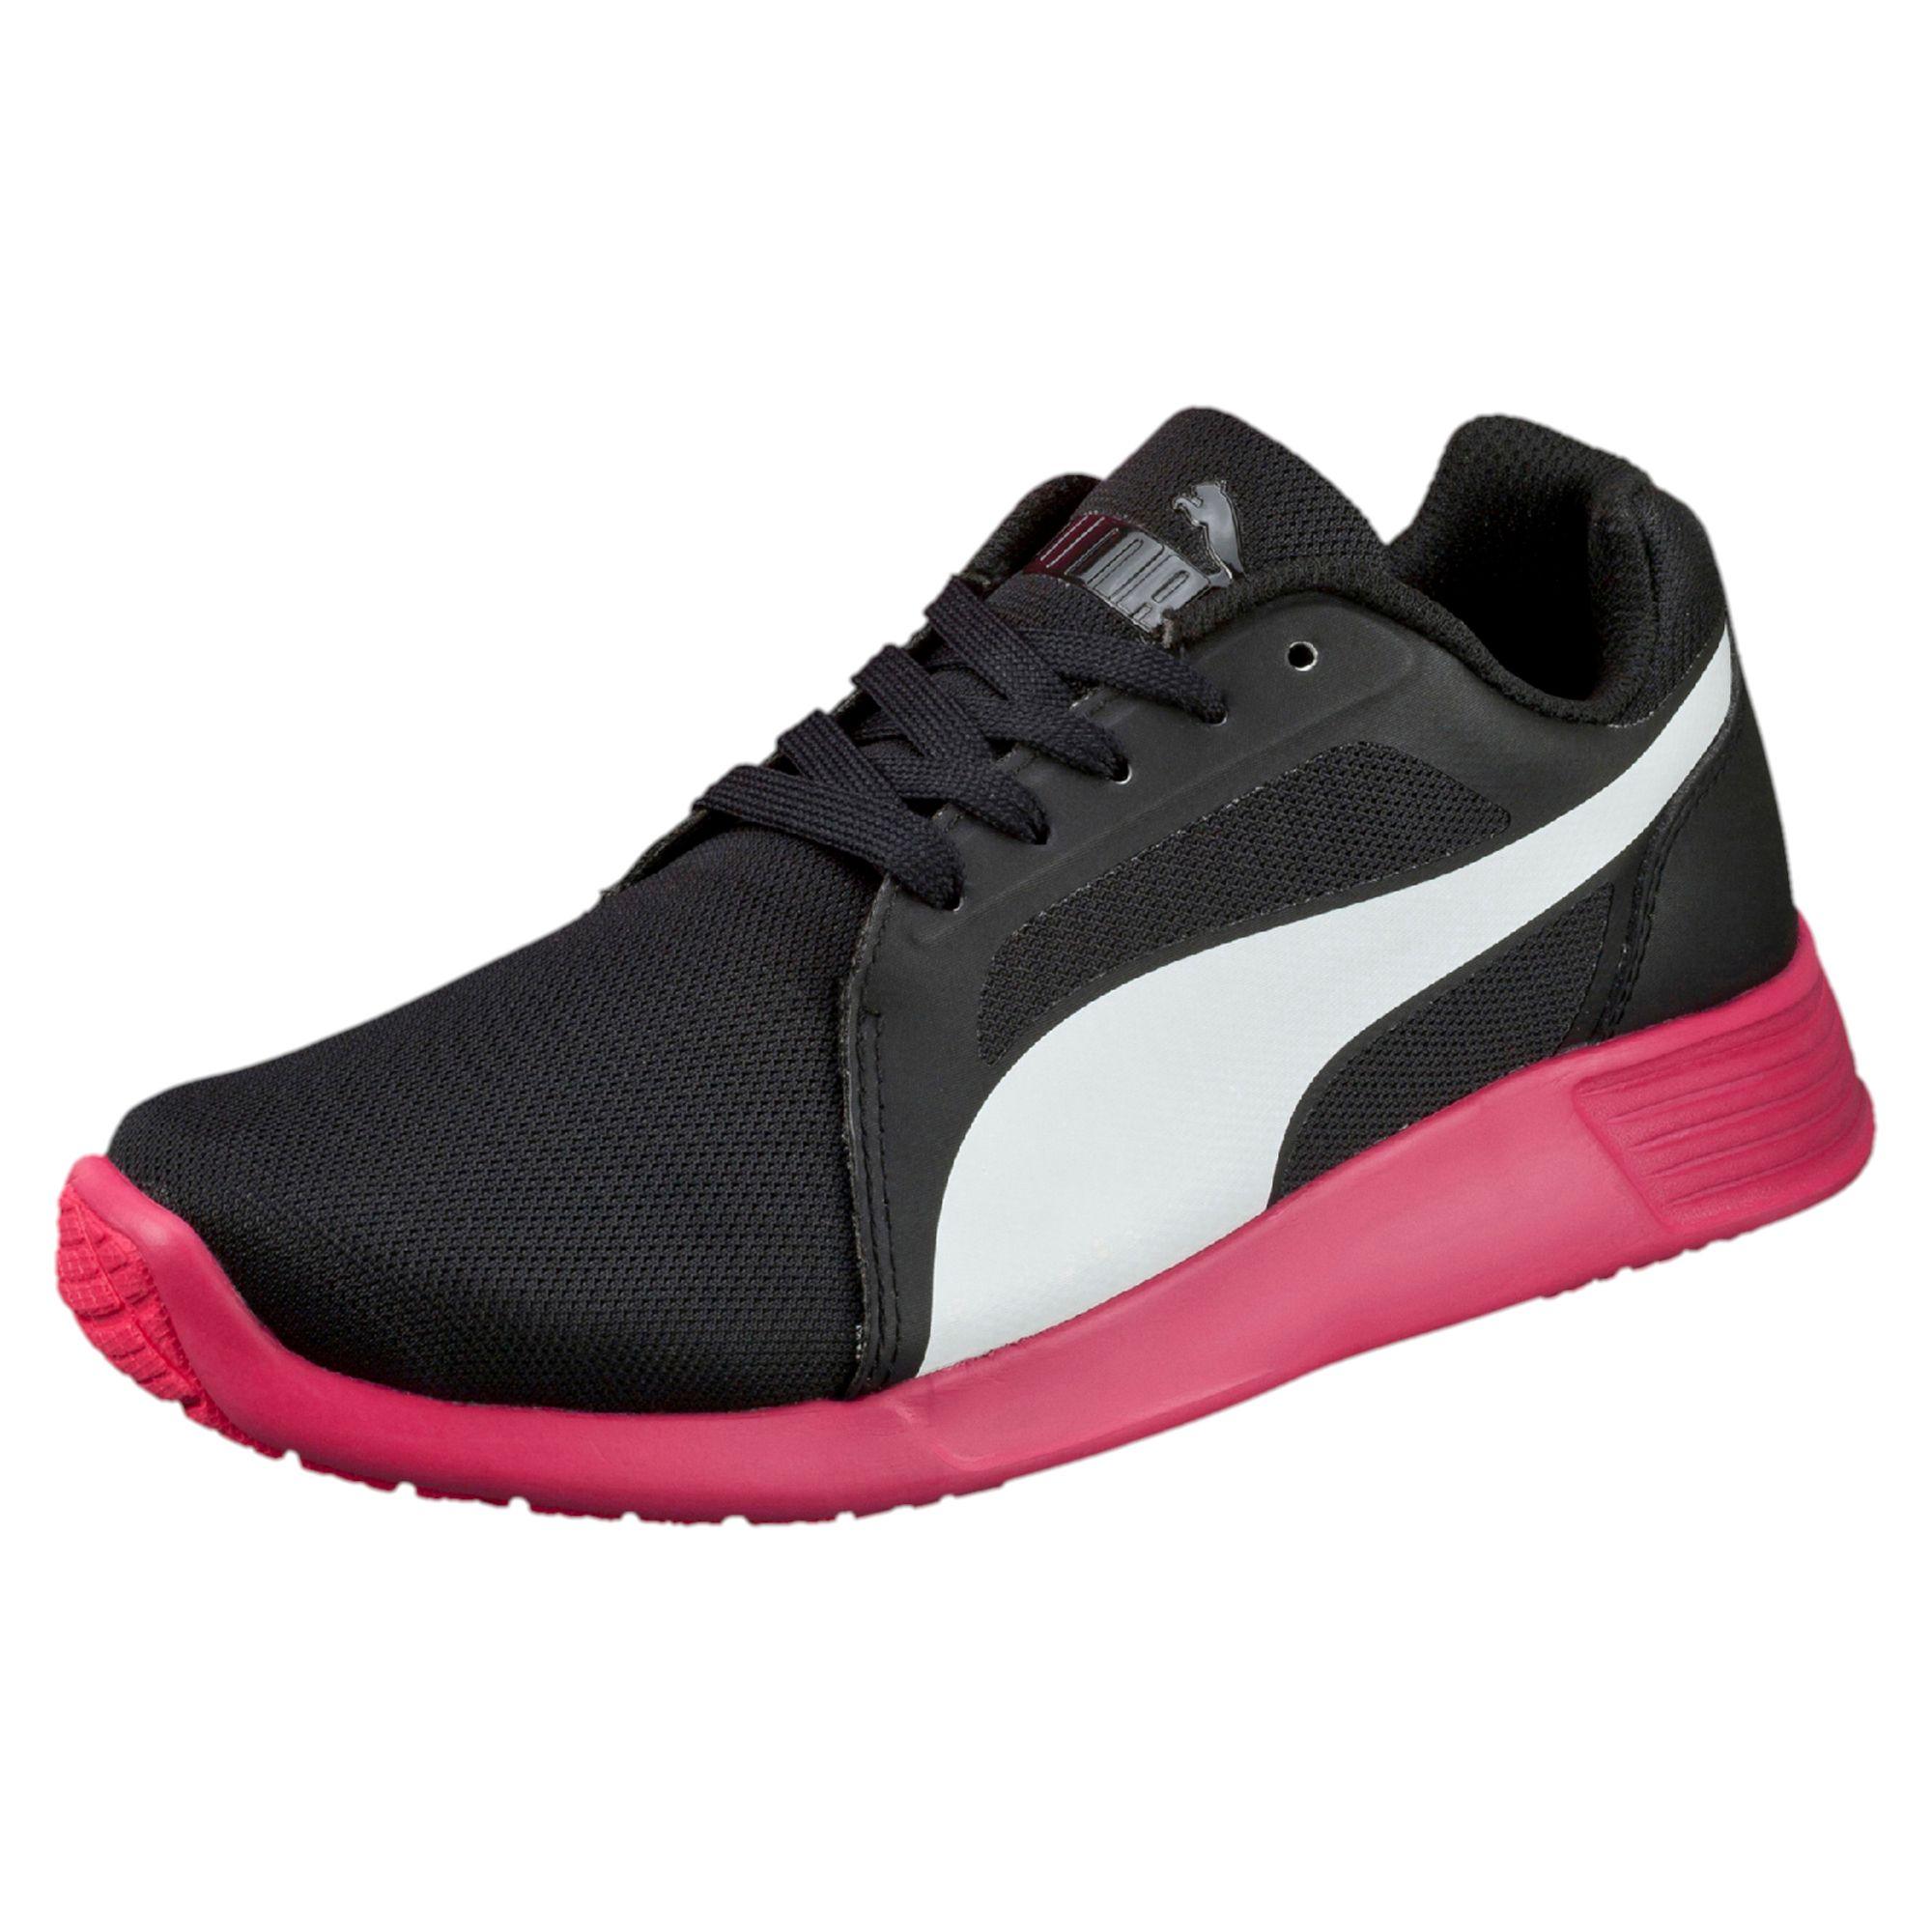 puma st trainer evo sneaker unisex schuhe basics neu ebay. Black Bedroom Furniture Sets. Home Design Ideas